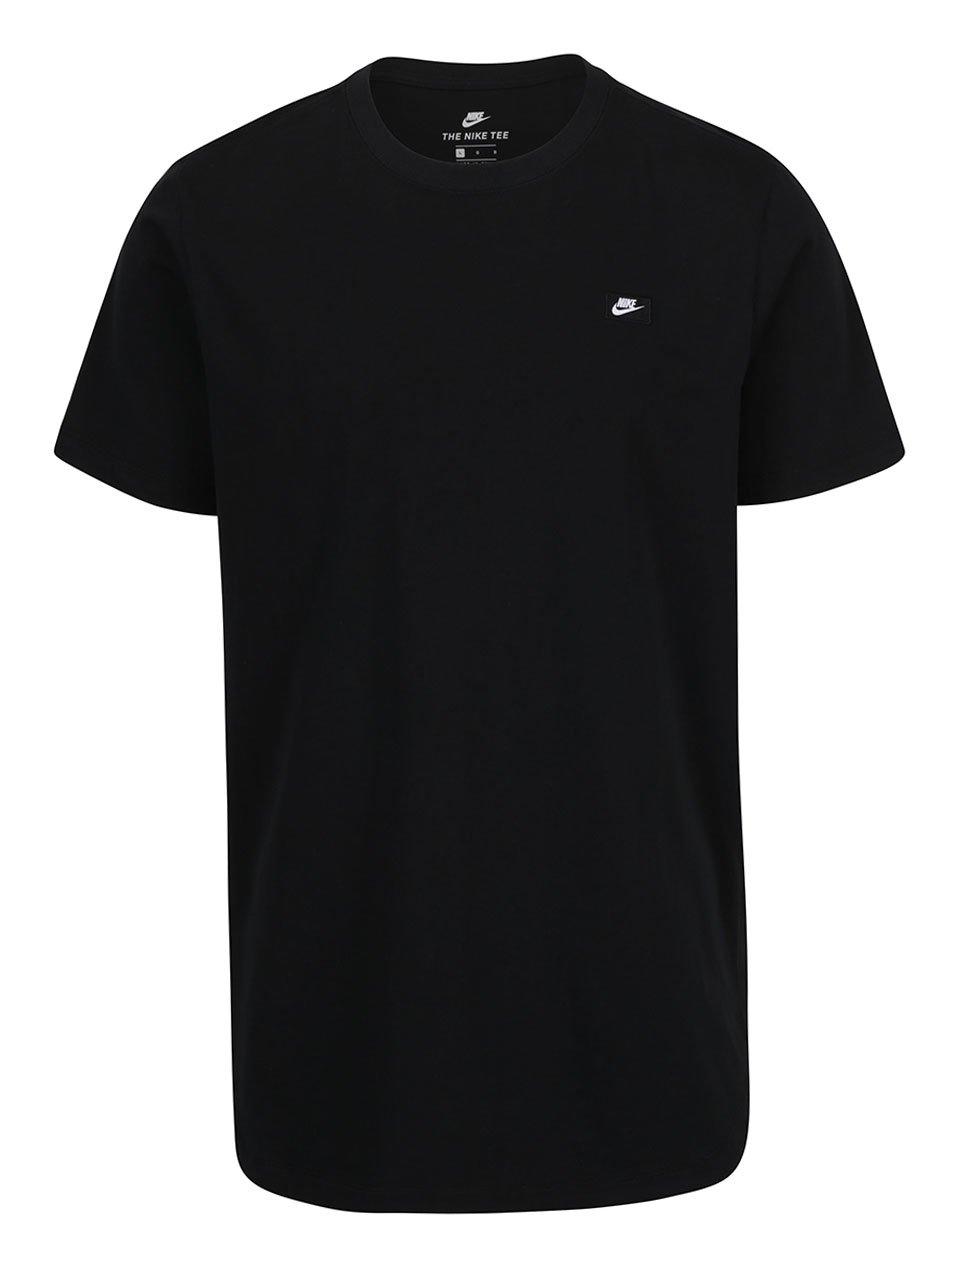 Černé pánské tričko s logem Nike Tee